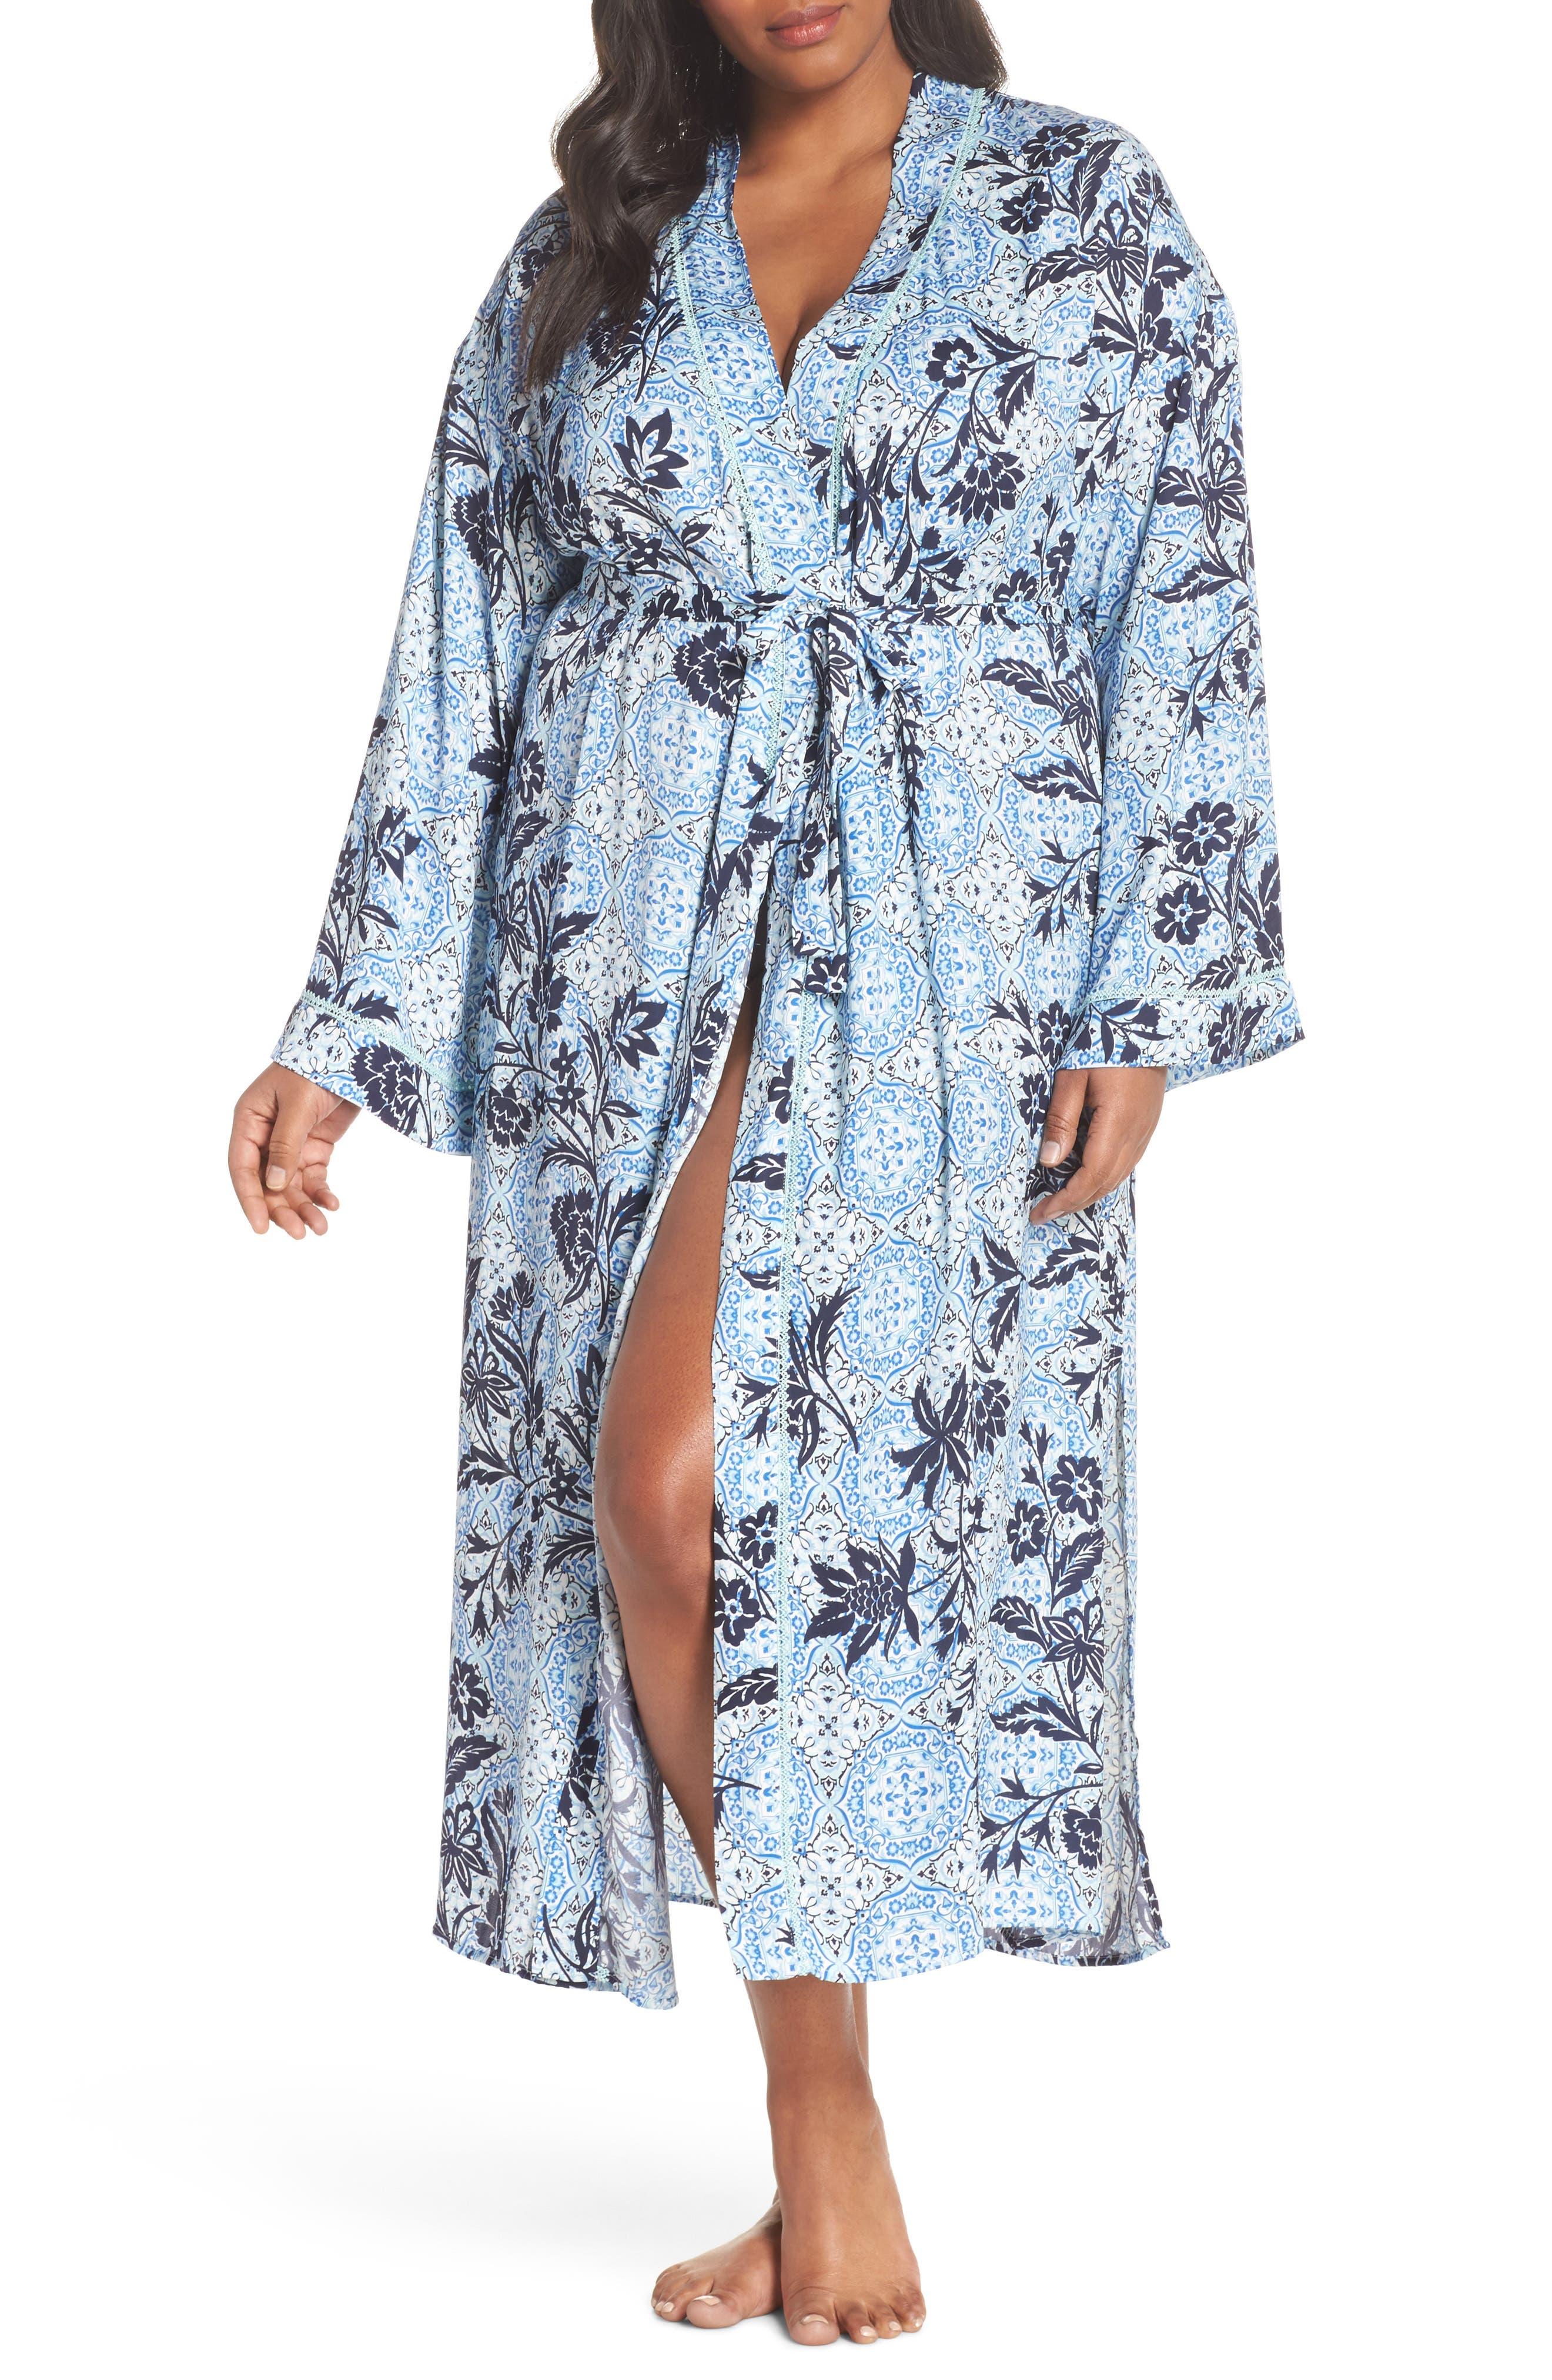 Main Image - Nordstrom Lingerie Sweet Dreams Satin Robe (Plus Size)